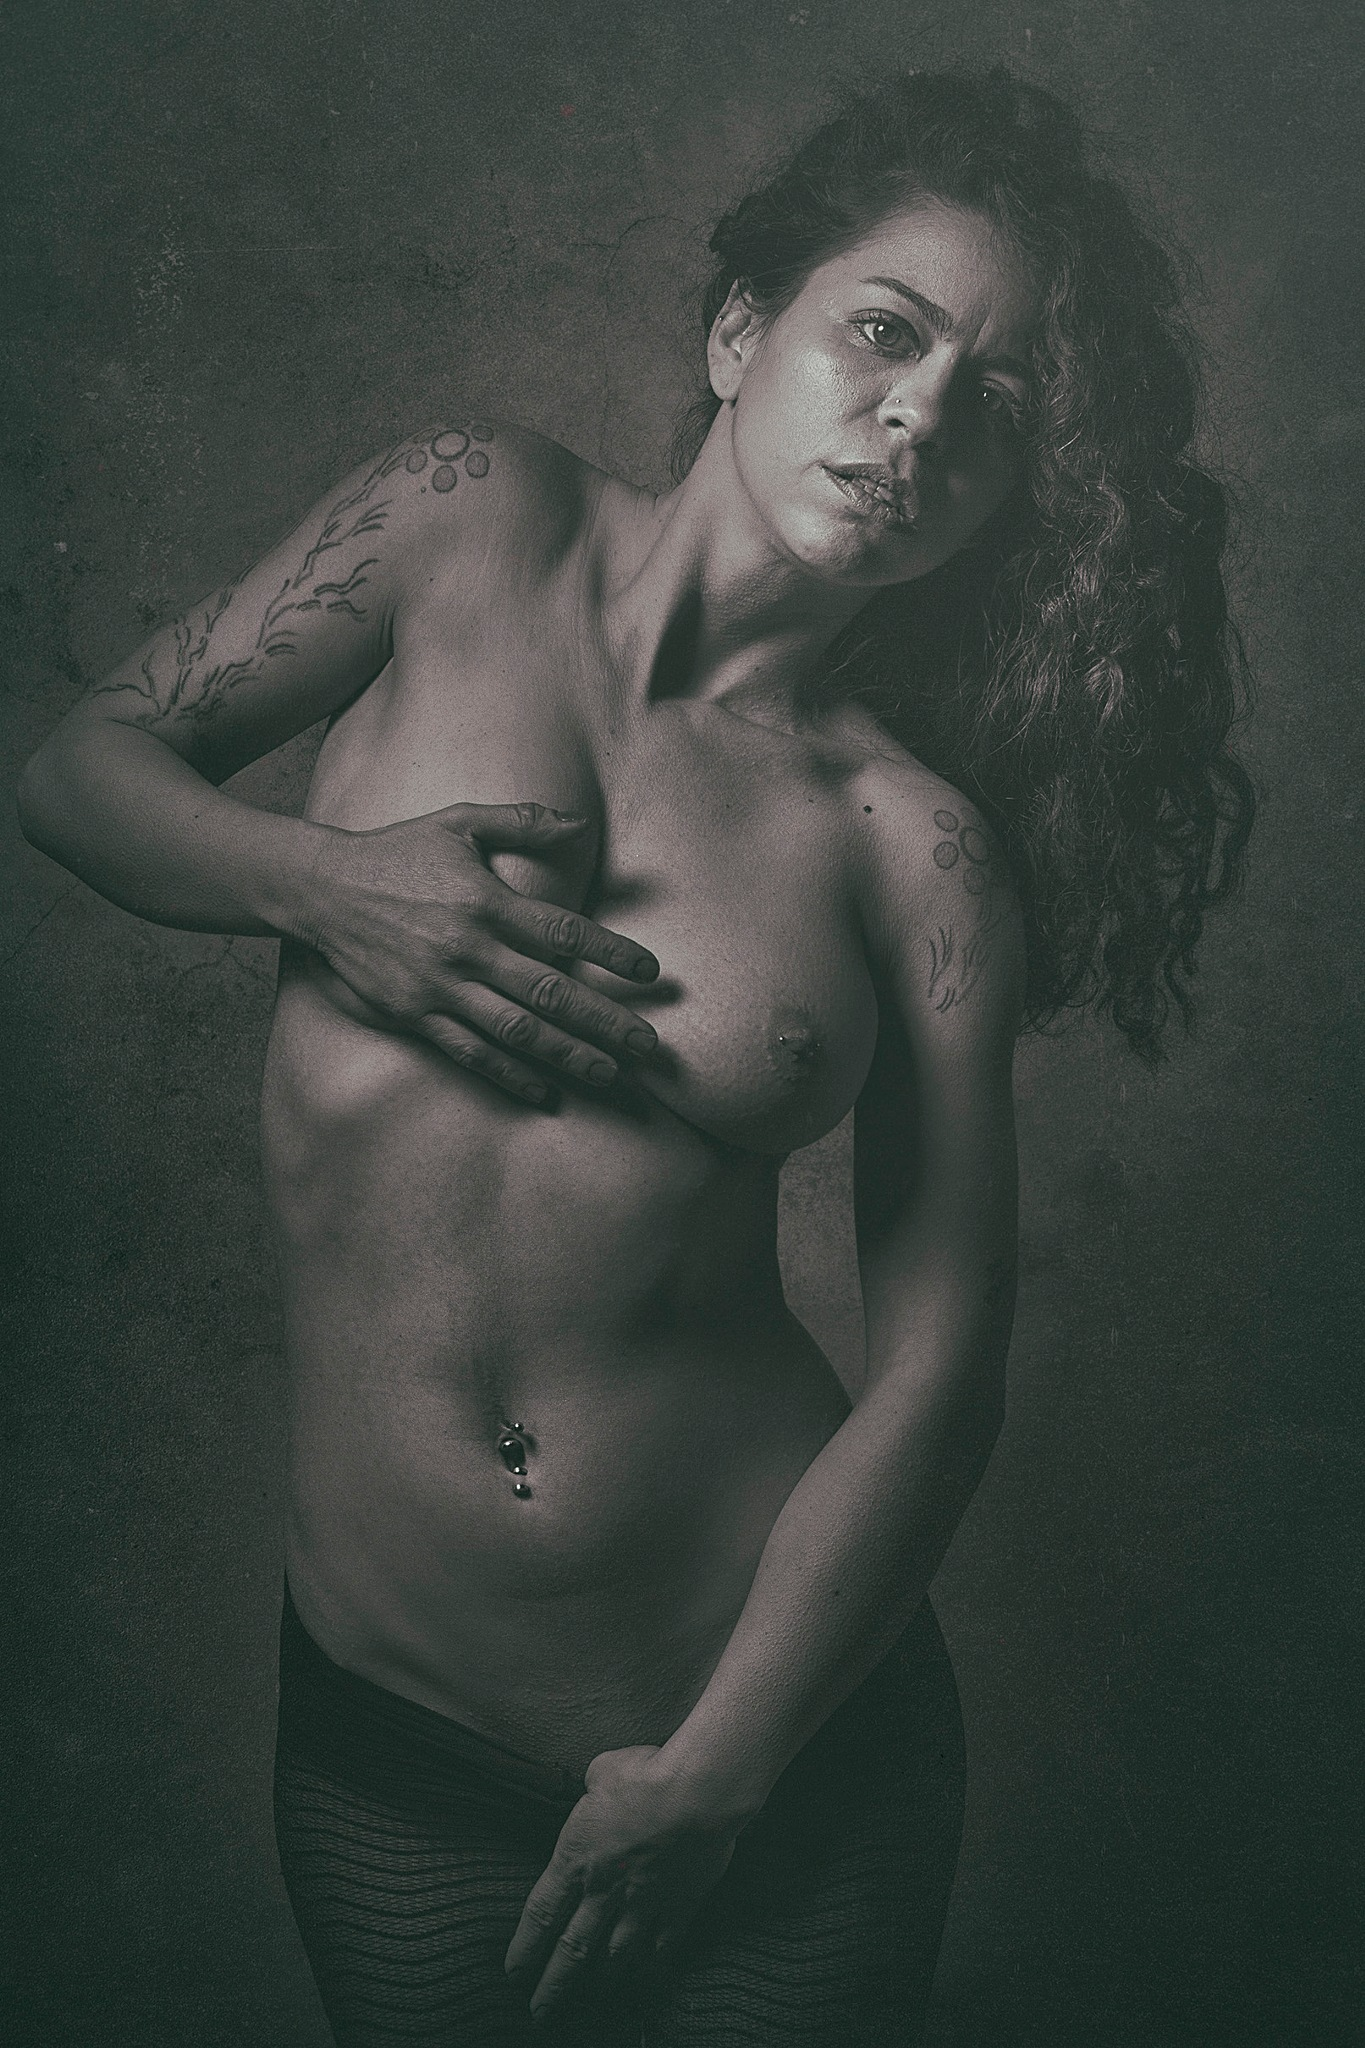 Untitled by Alejandro Ferrer